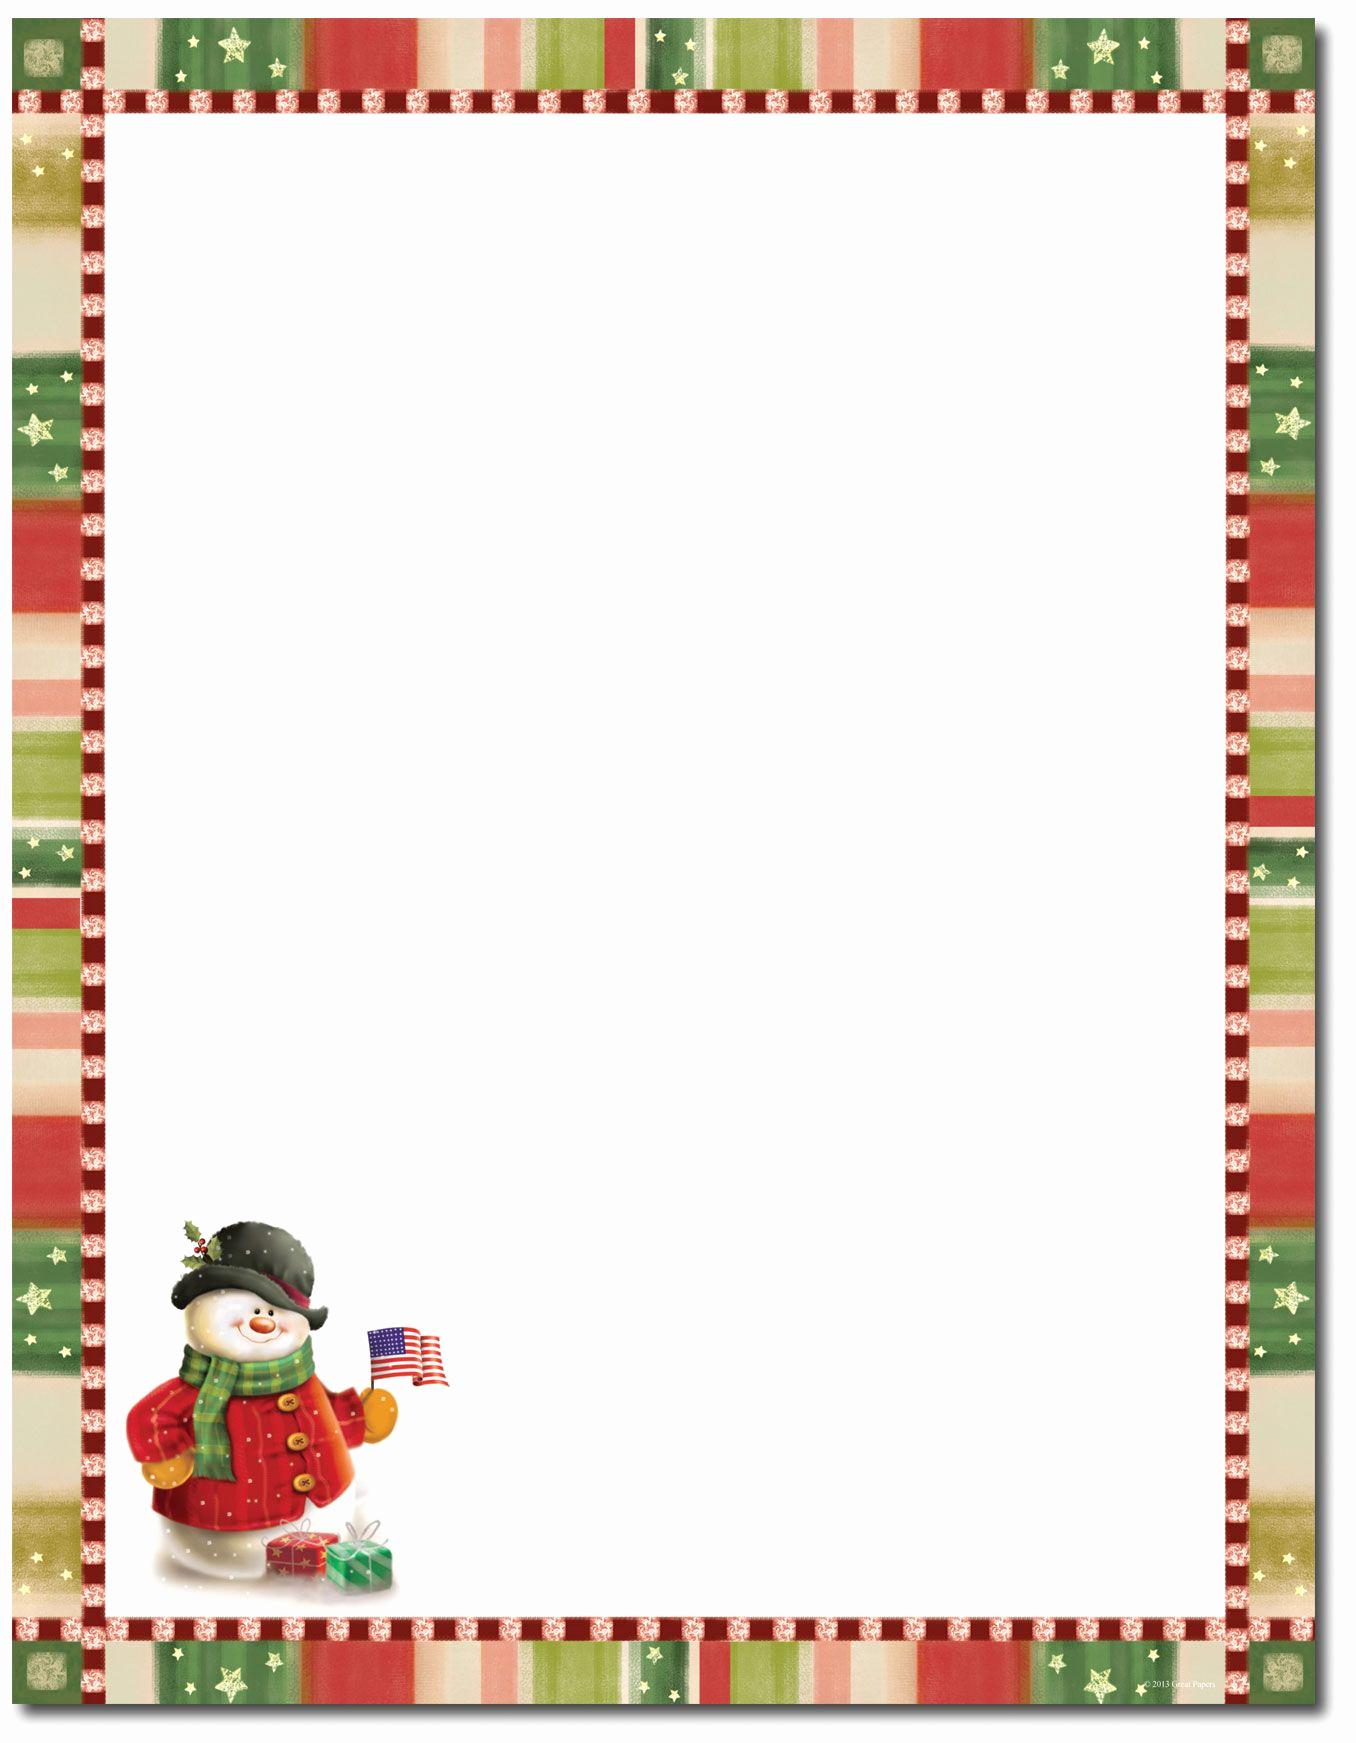 Free Printable Christmas Paper Inspirational Christmas Stationery